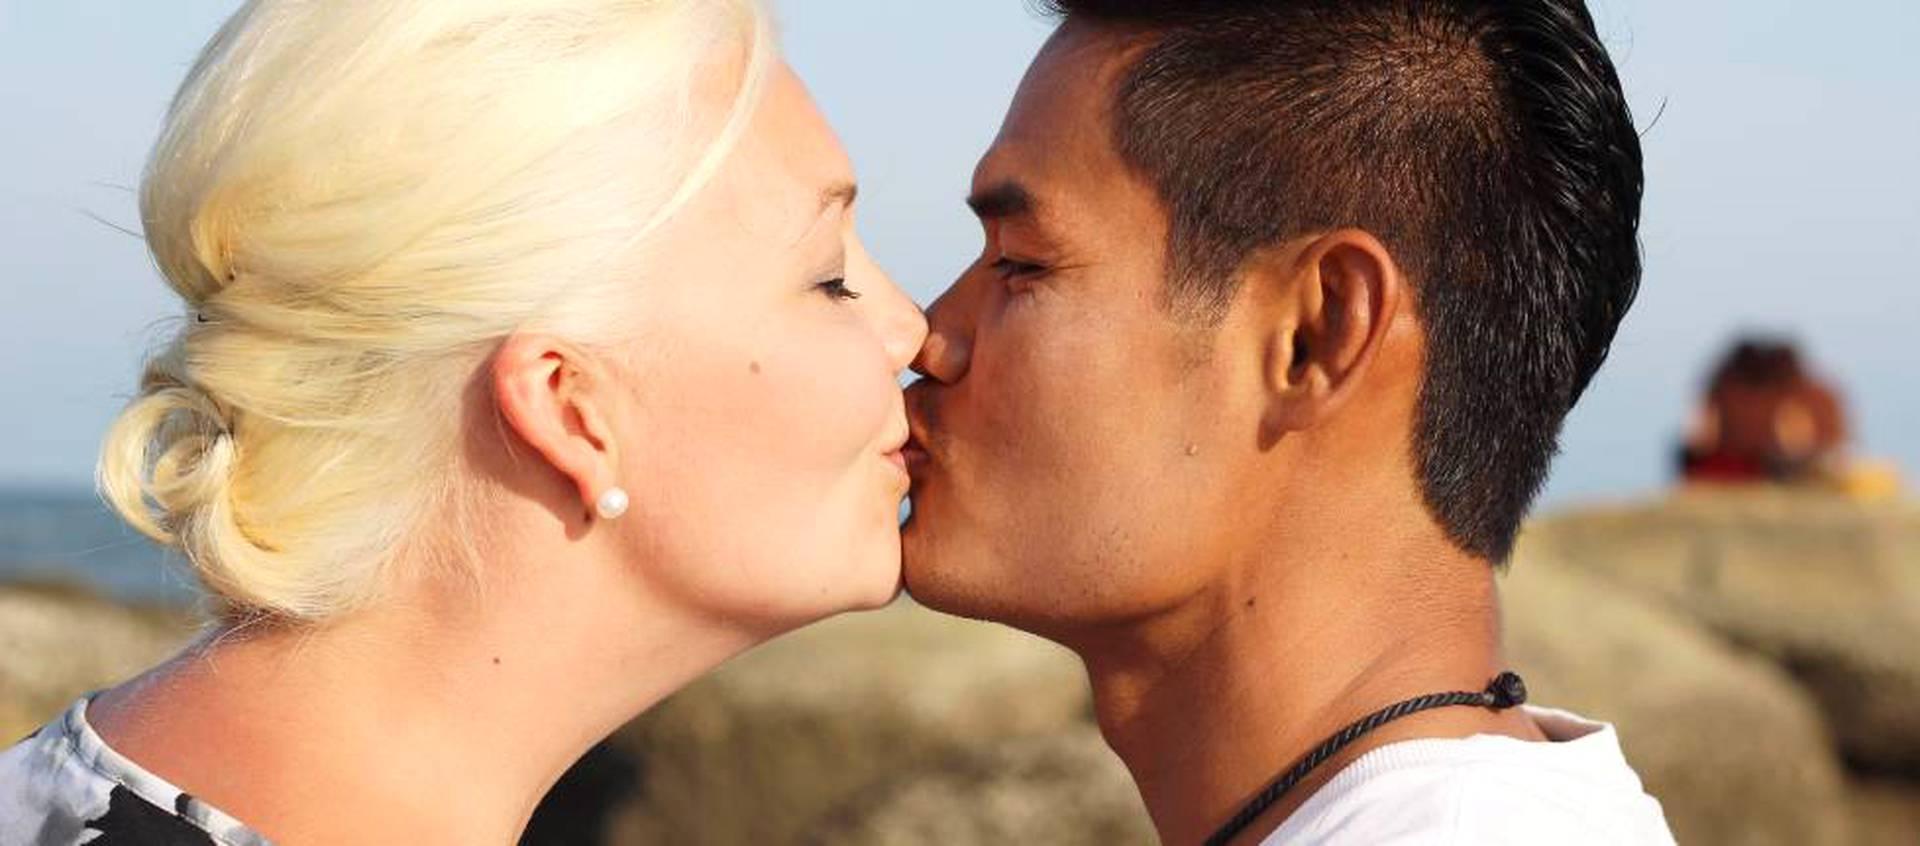 Warri dating